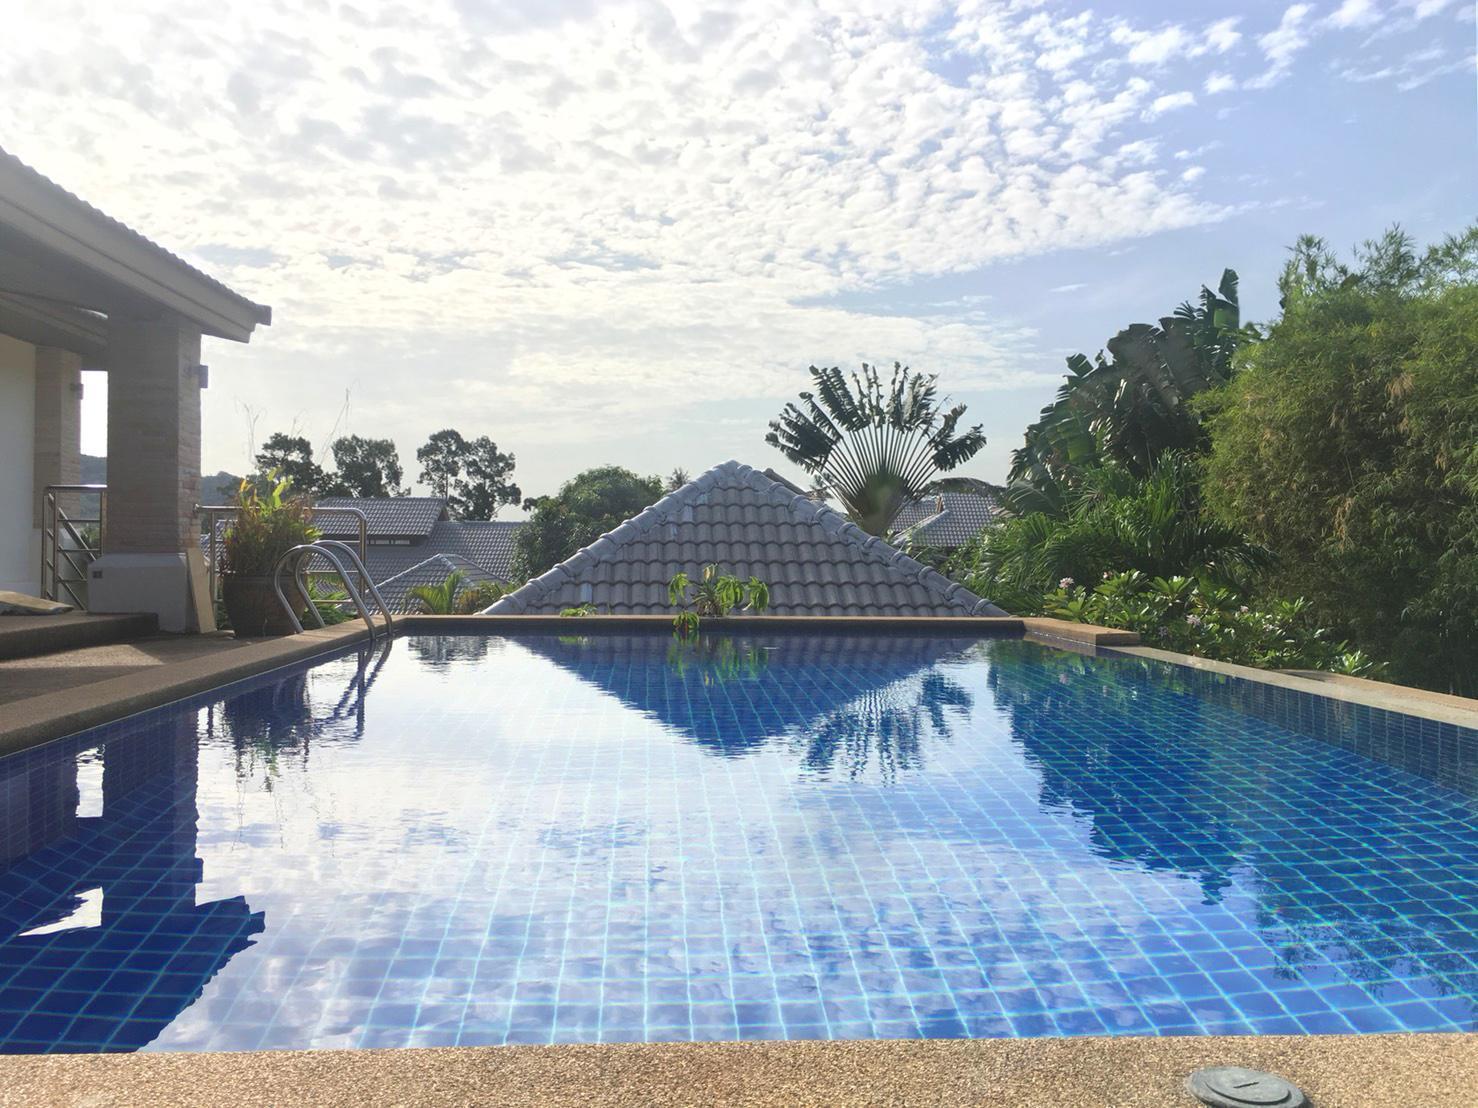 Luxury 4 bedroom family villa with private pool. วิลลา 4 ห้องนอน 4 ห้องน้ำส่วนตัว ขนาด 840 ตร.ม. – หาดบ่อผุด